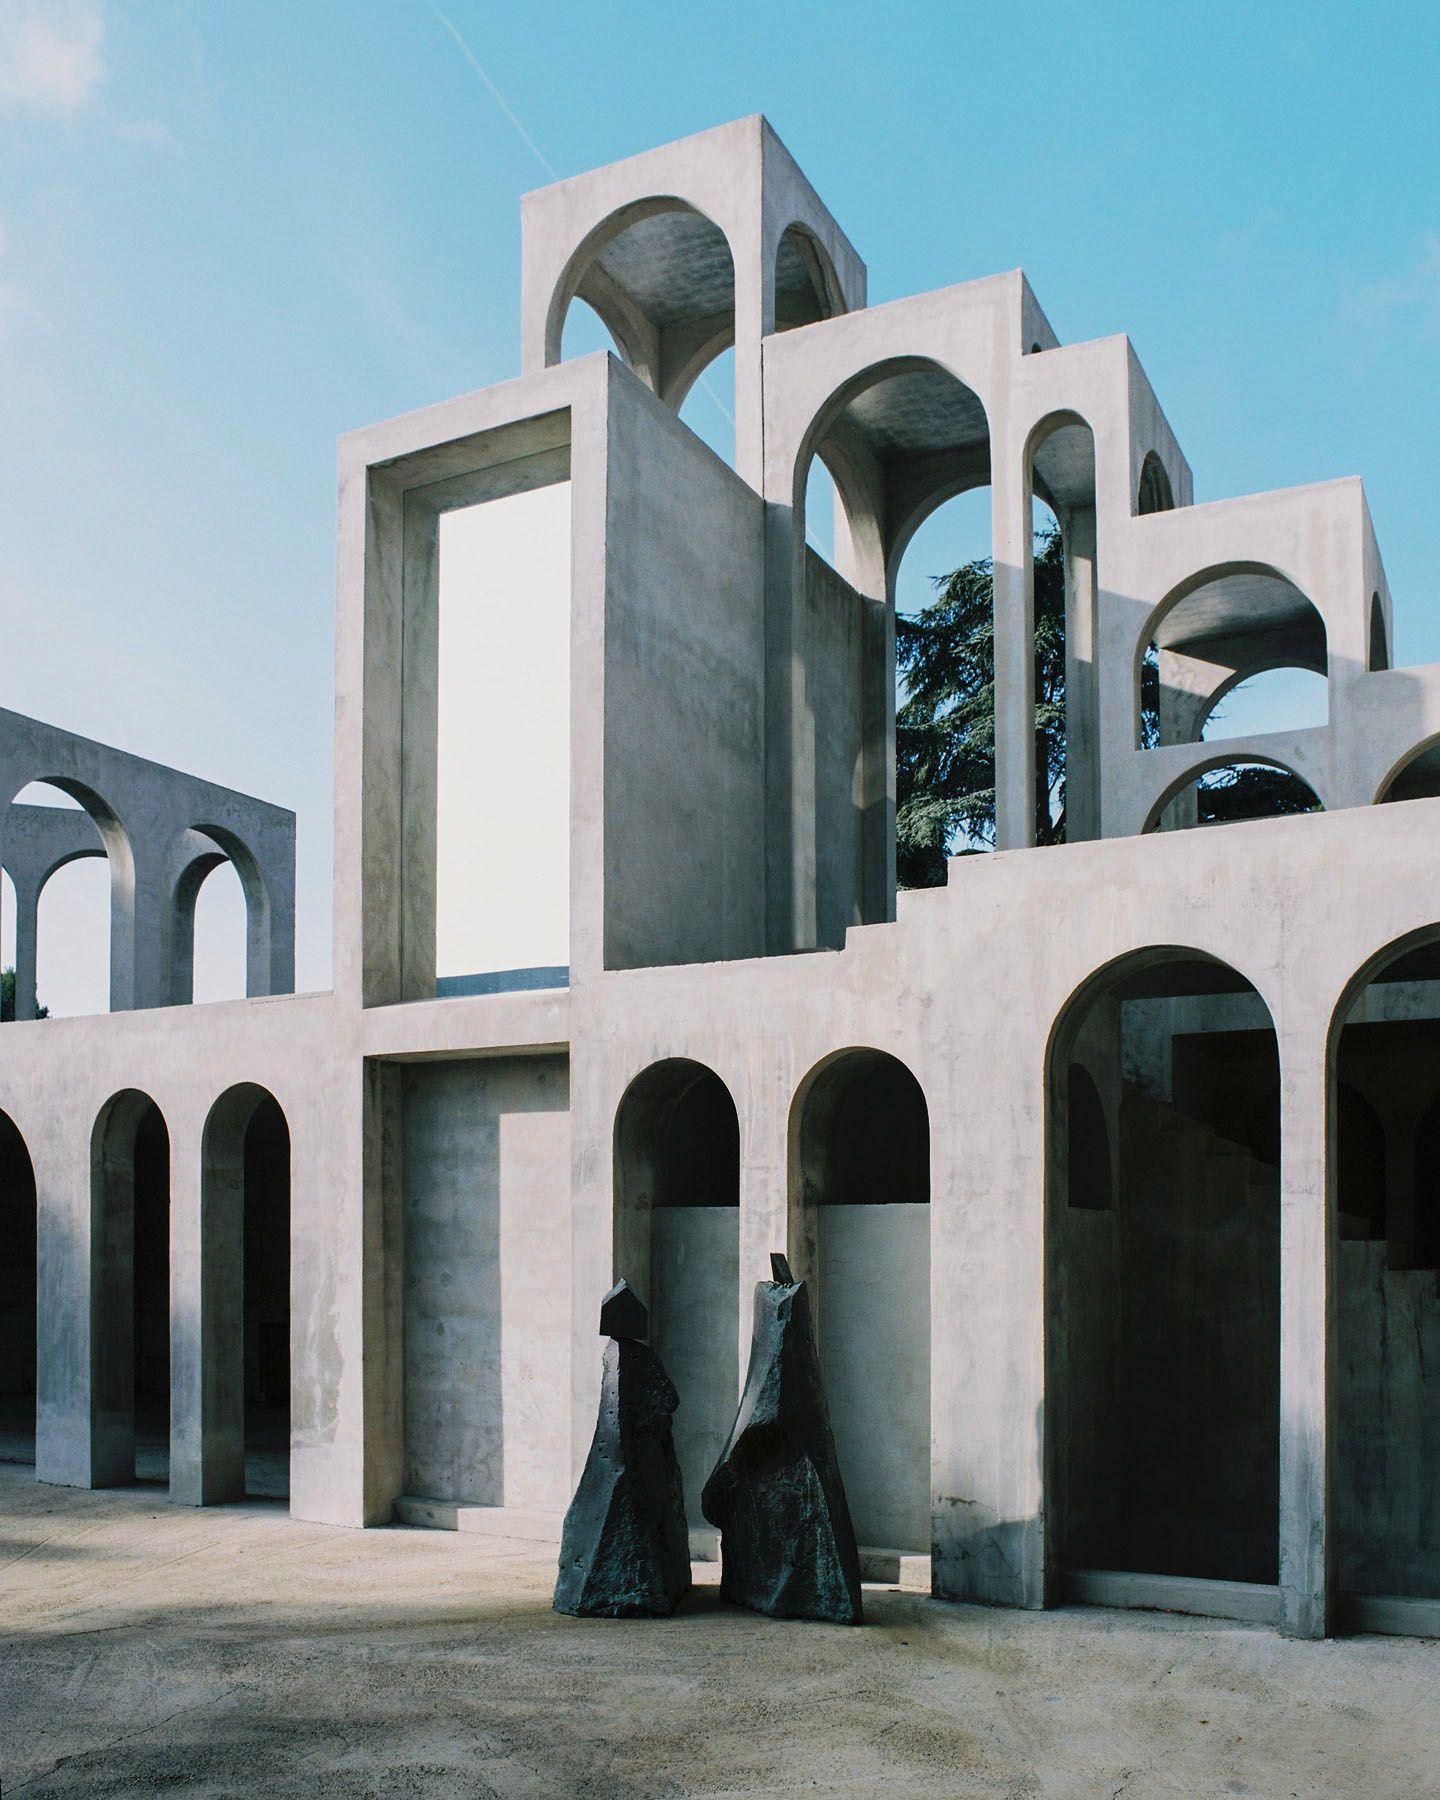 Хавьер Корберо. Дом-башня скульптора | A R C H | Pinterest ...